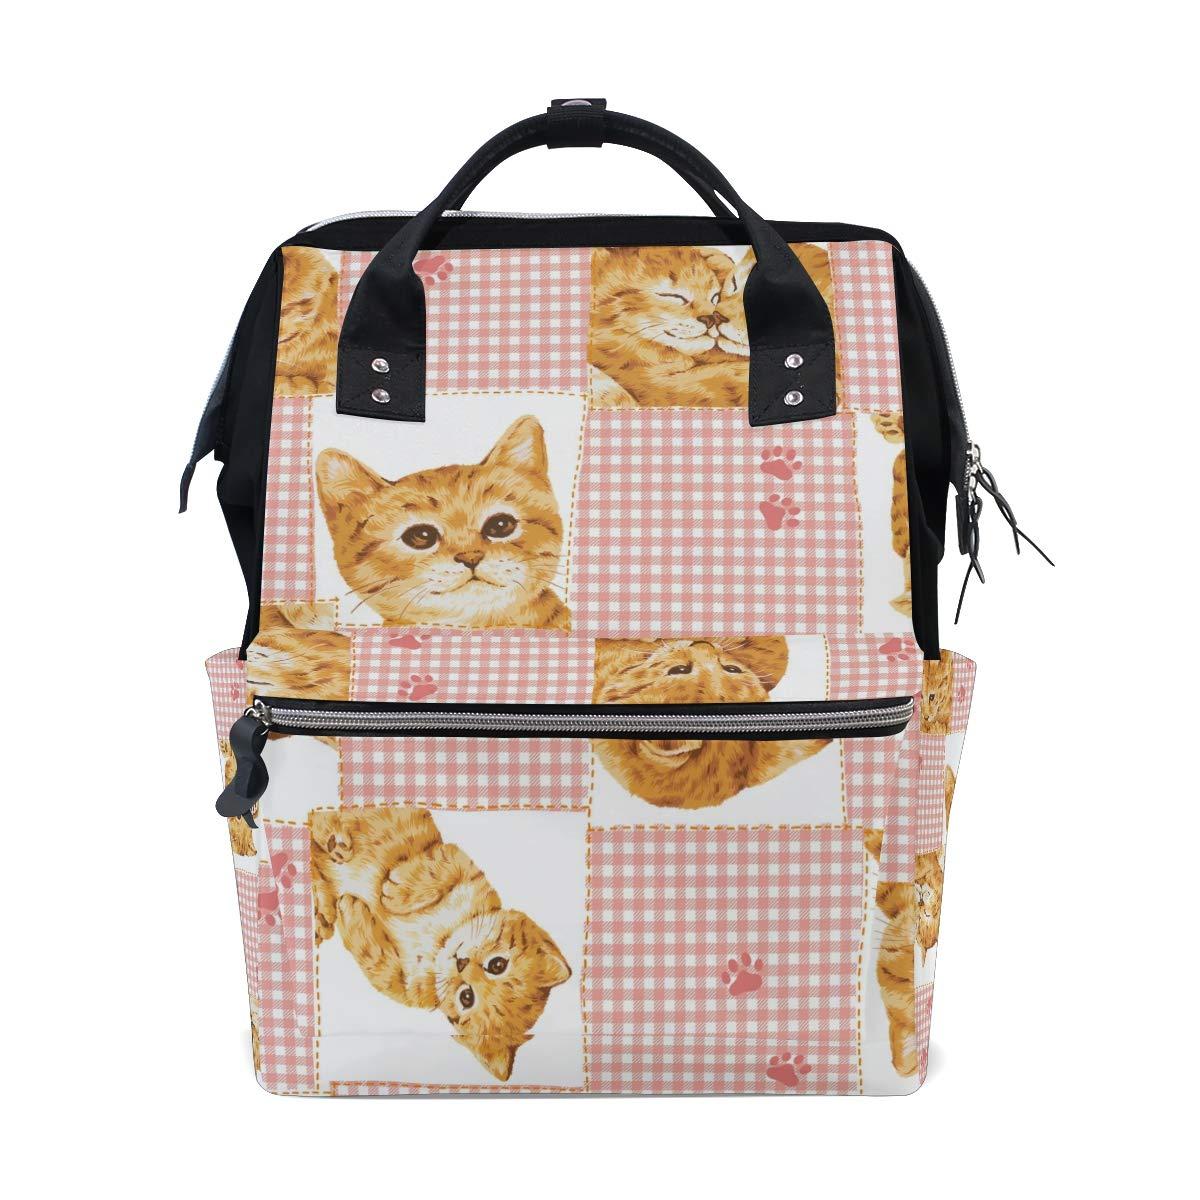 MERRYSUGAR Diaper Bag Baby Bag Backpack Kitten Checks Pink School Backpack Mommy Bag Large Multifunction Travel Bag